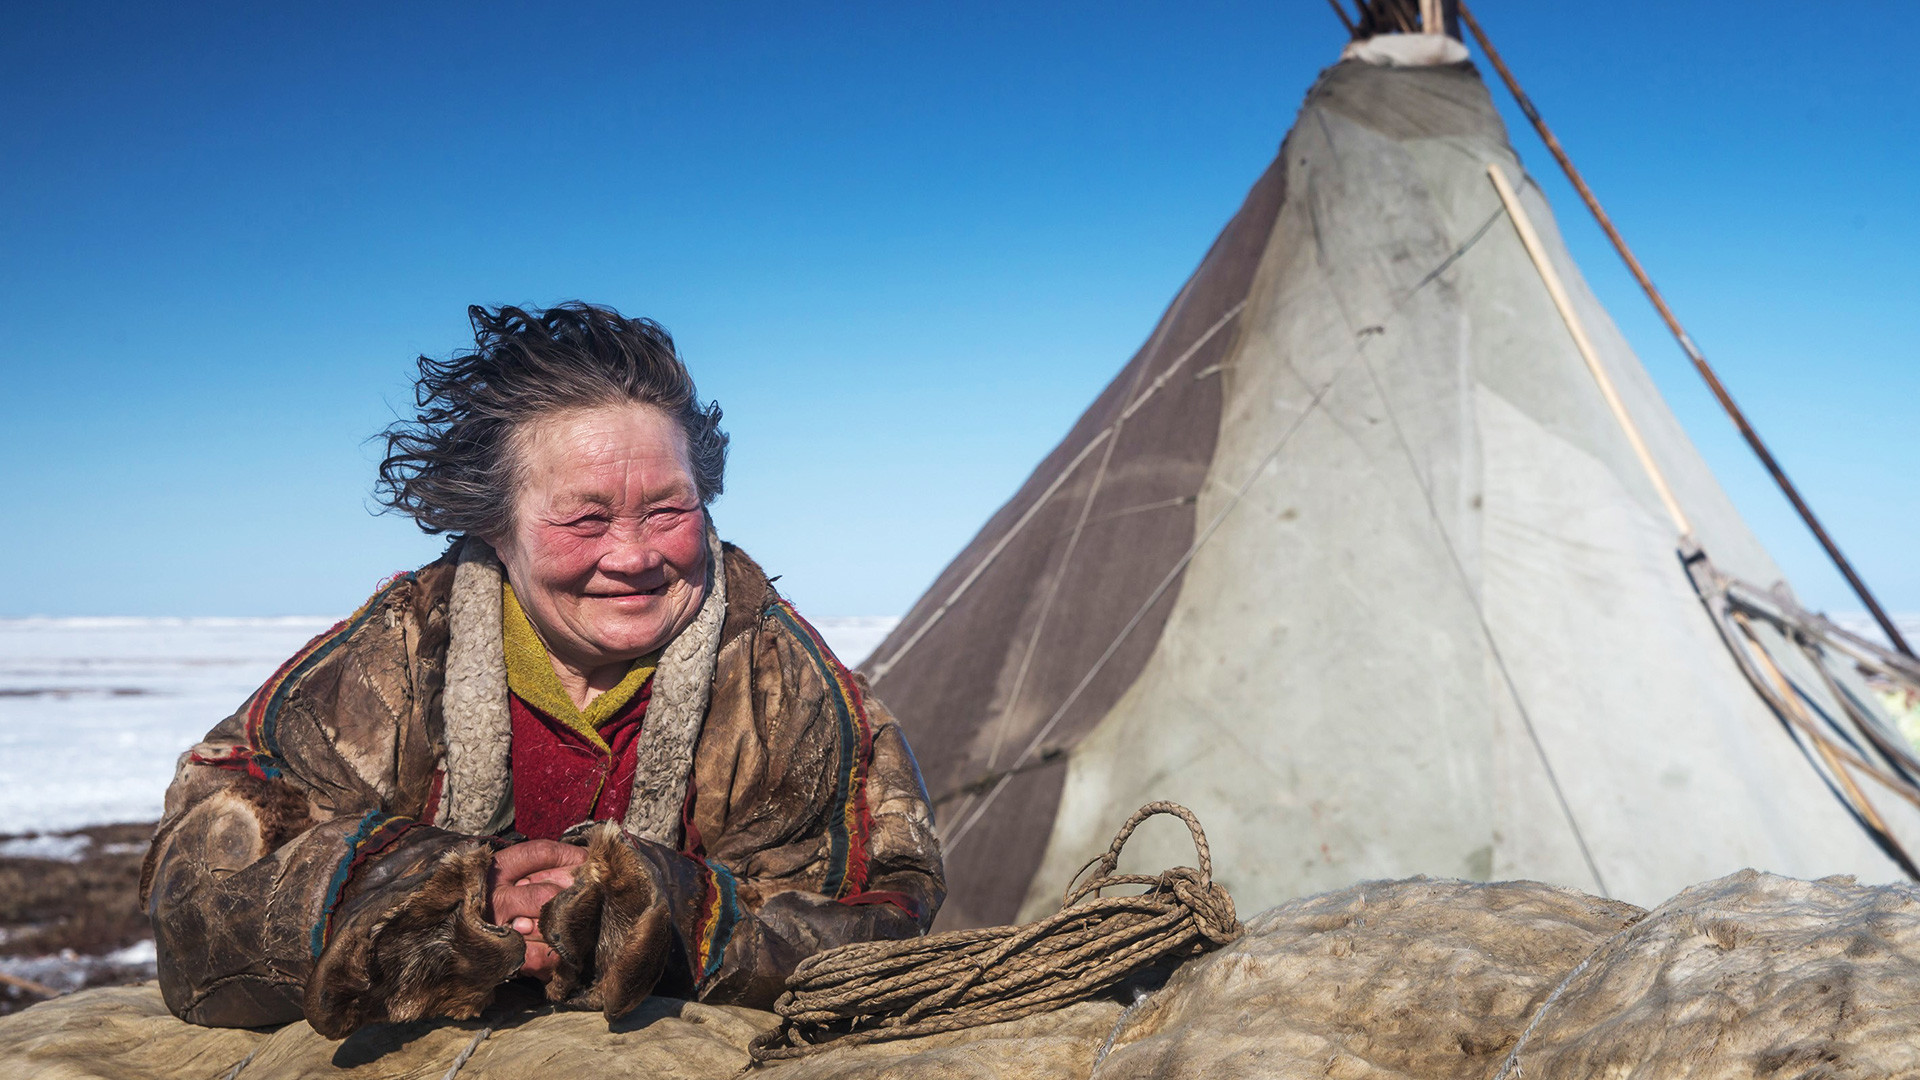 Seorang gembala rusa di sebuah kamp nomaden, 150 km dari Kota Salekhard, Okrug Otonom Yamalo-Nenets, 2 Mei 2016.